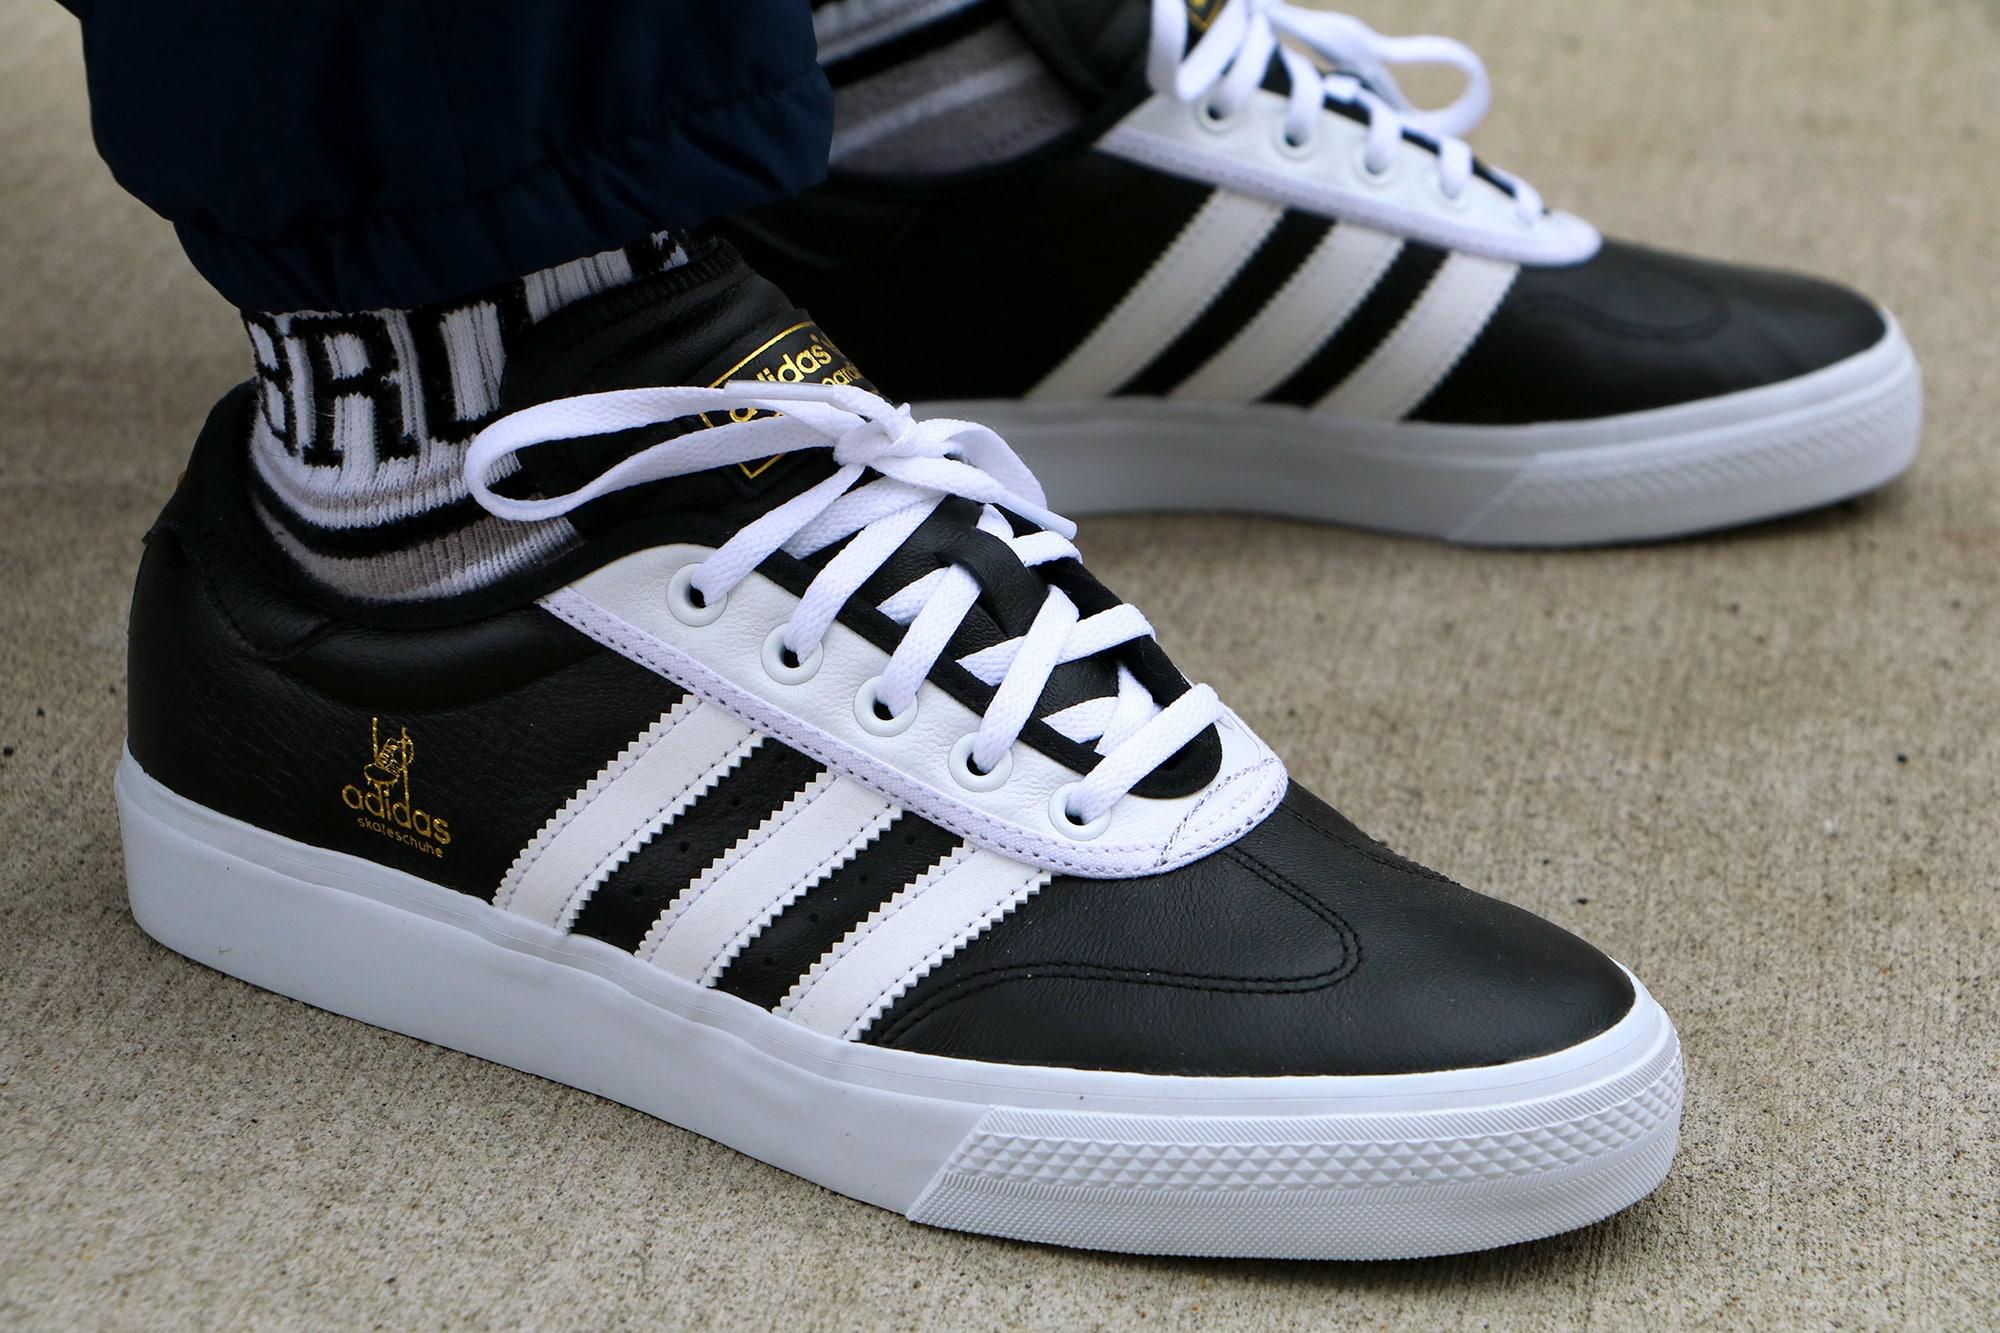 Adidas Adi Ease Black Shoes